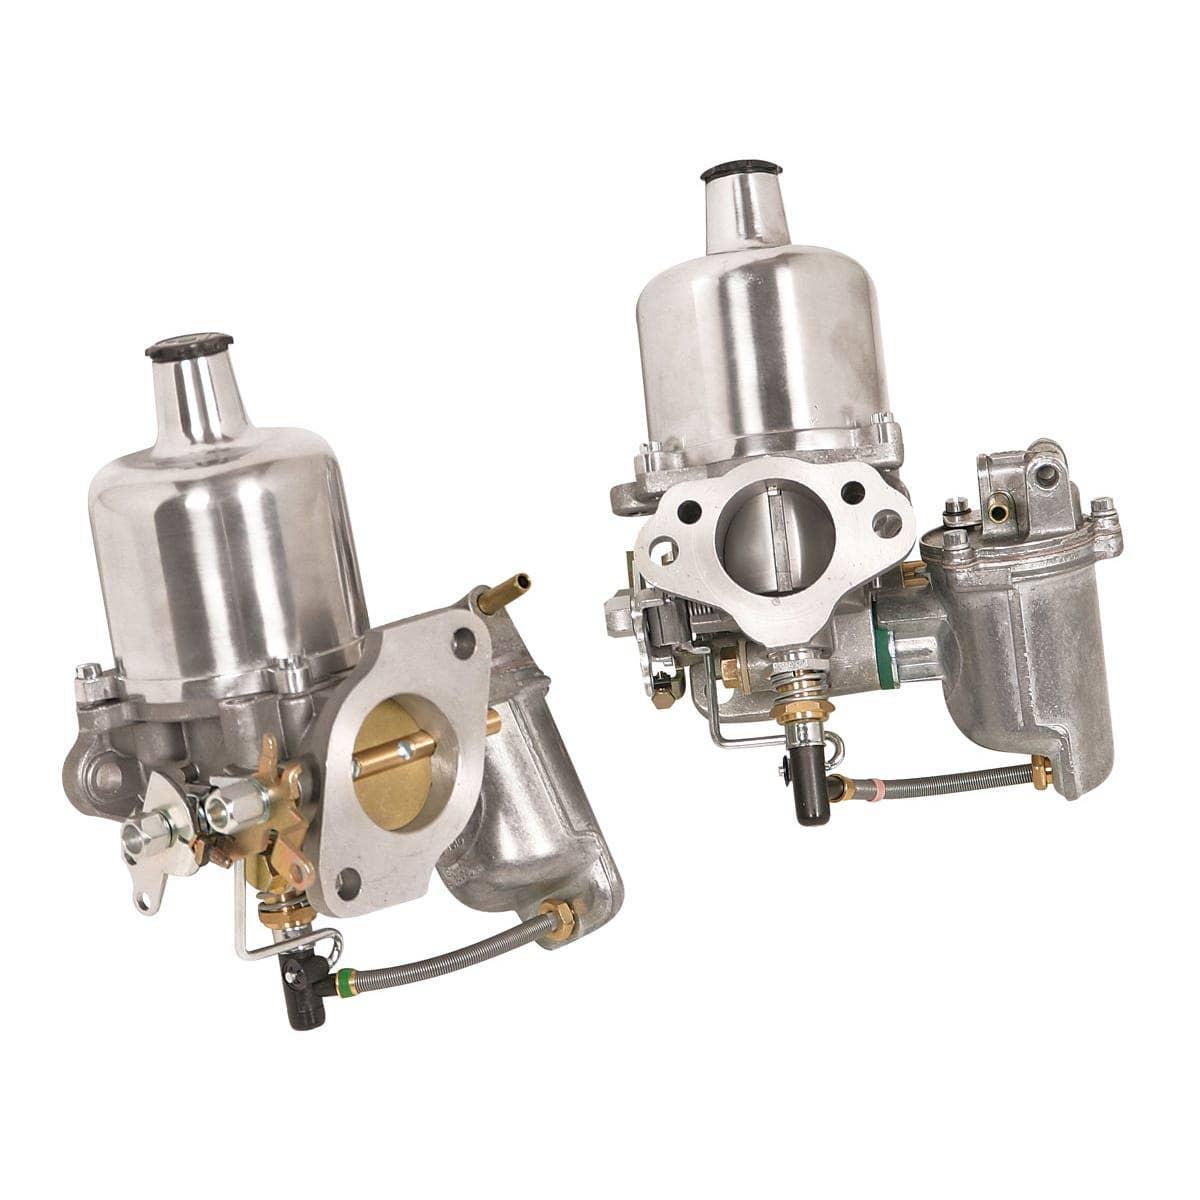 366 418 Hs6 Carburetor Conversion Kit With Heatshield By Genuine Su Fuel Pump Diagram Sets 1962 67 Replaces Aud52 Aud135